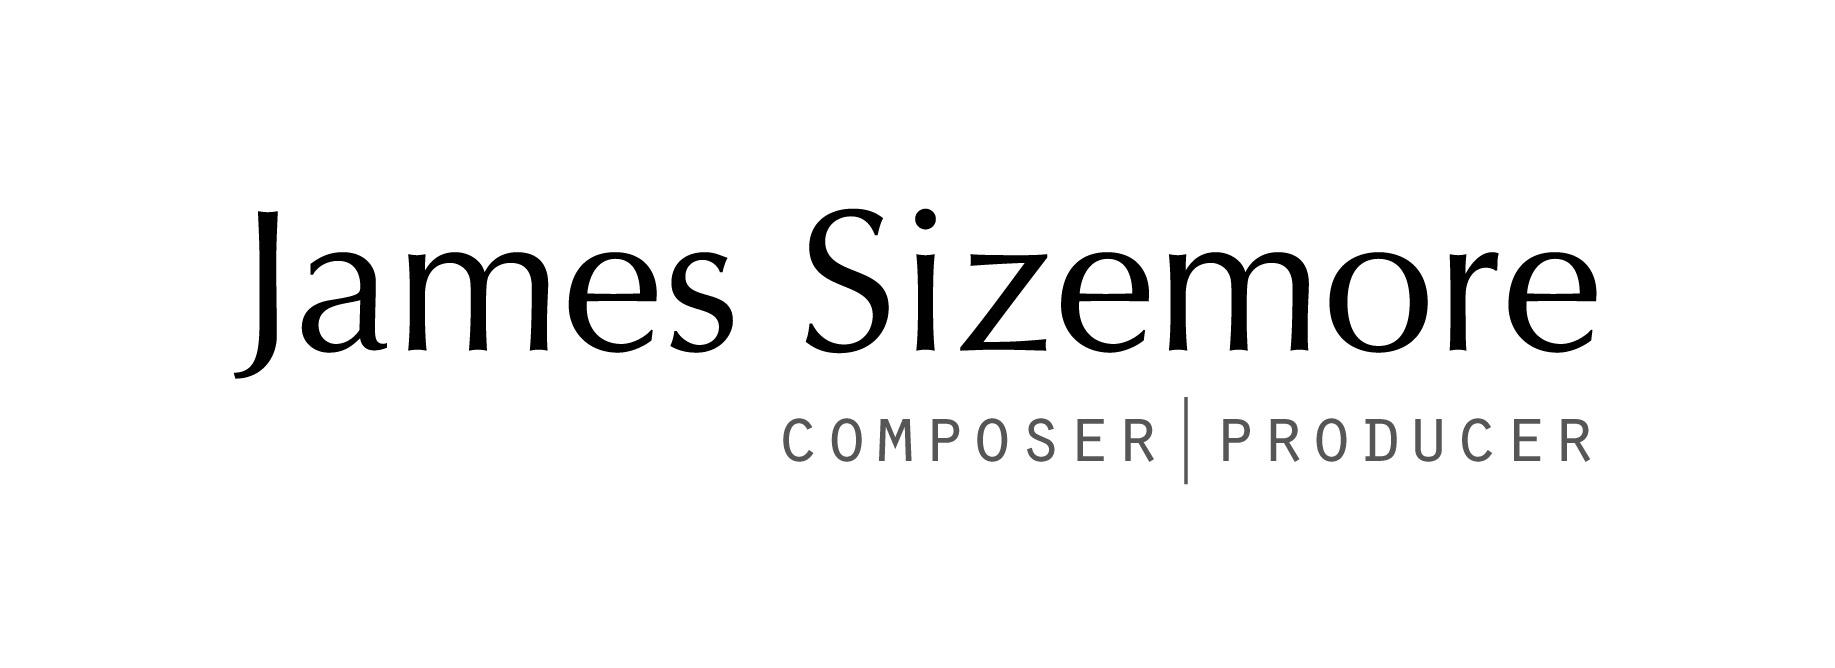 James Sizemore Logo